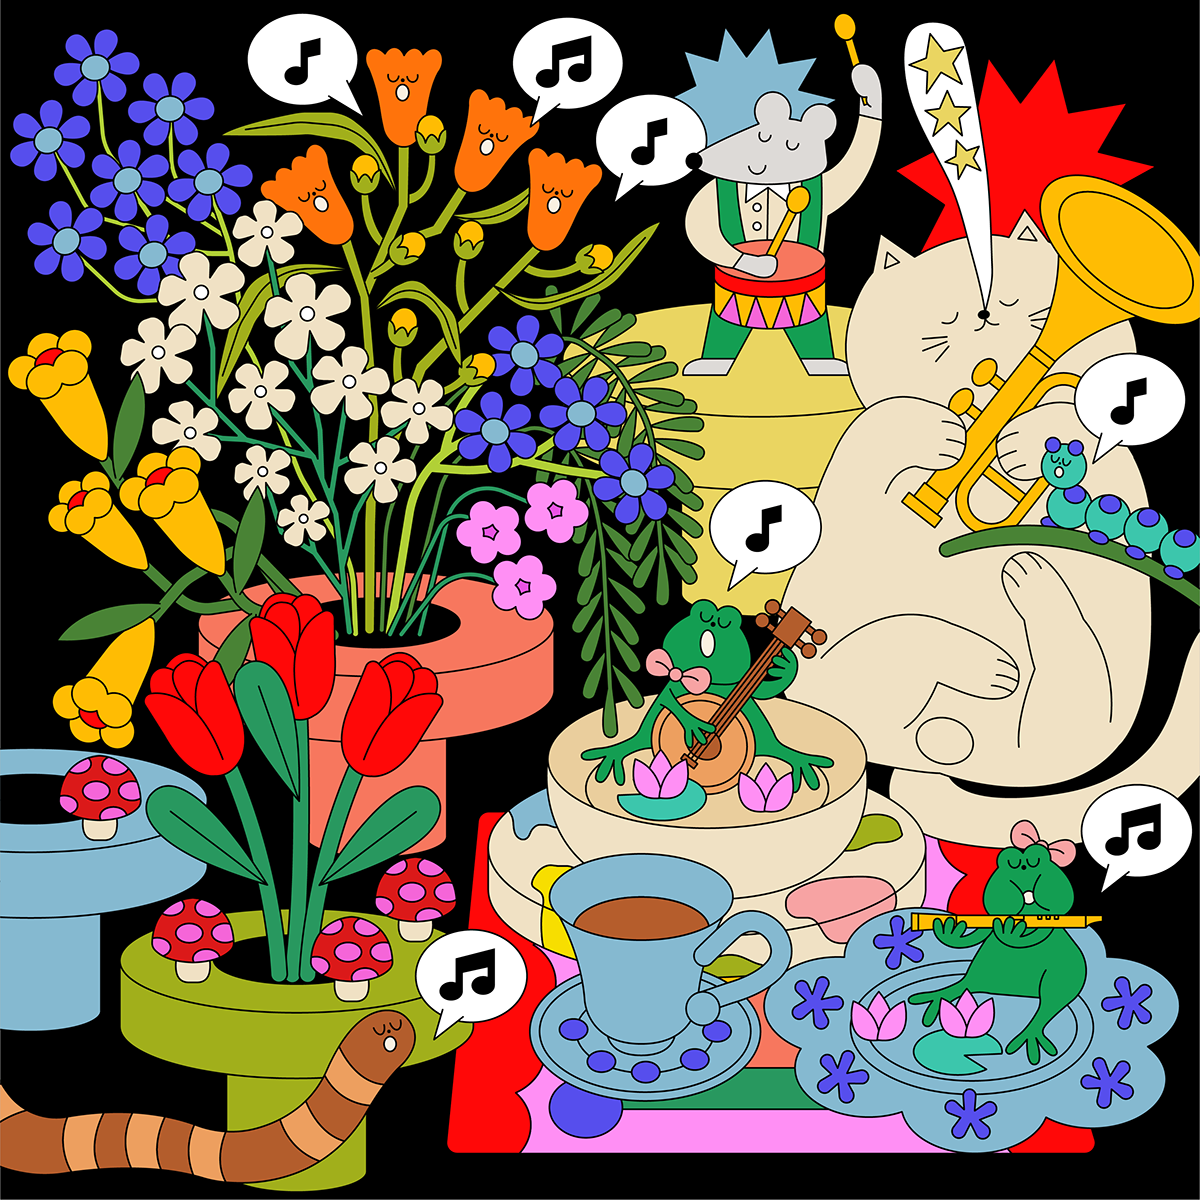 animals animation  flower graphic design  ILLUSTRATION  Illustrator music pattern poster summer